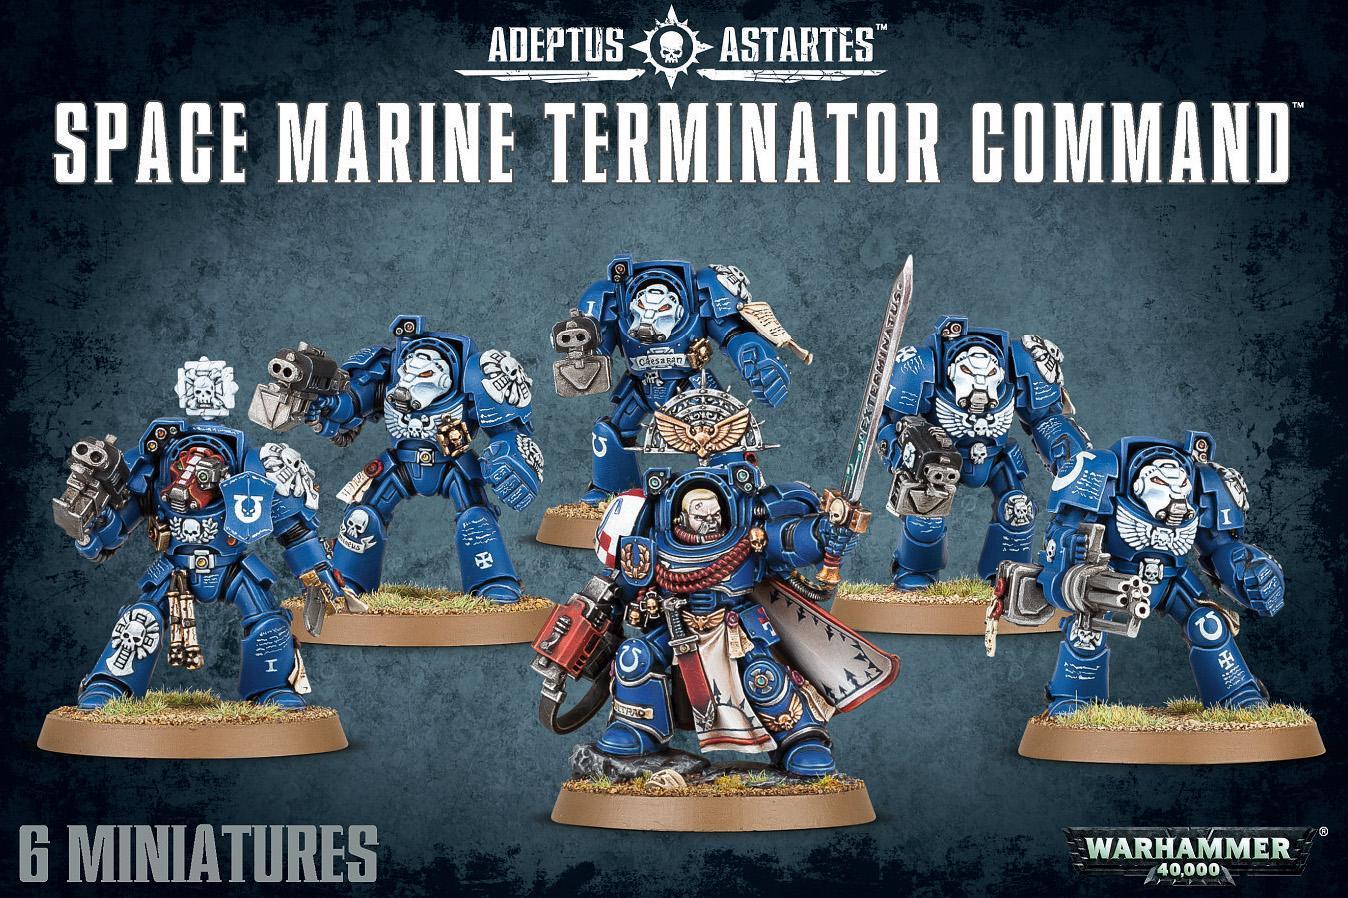 Space Marine Terminator Command